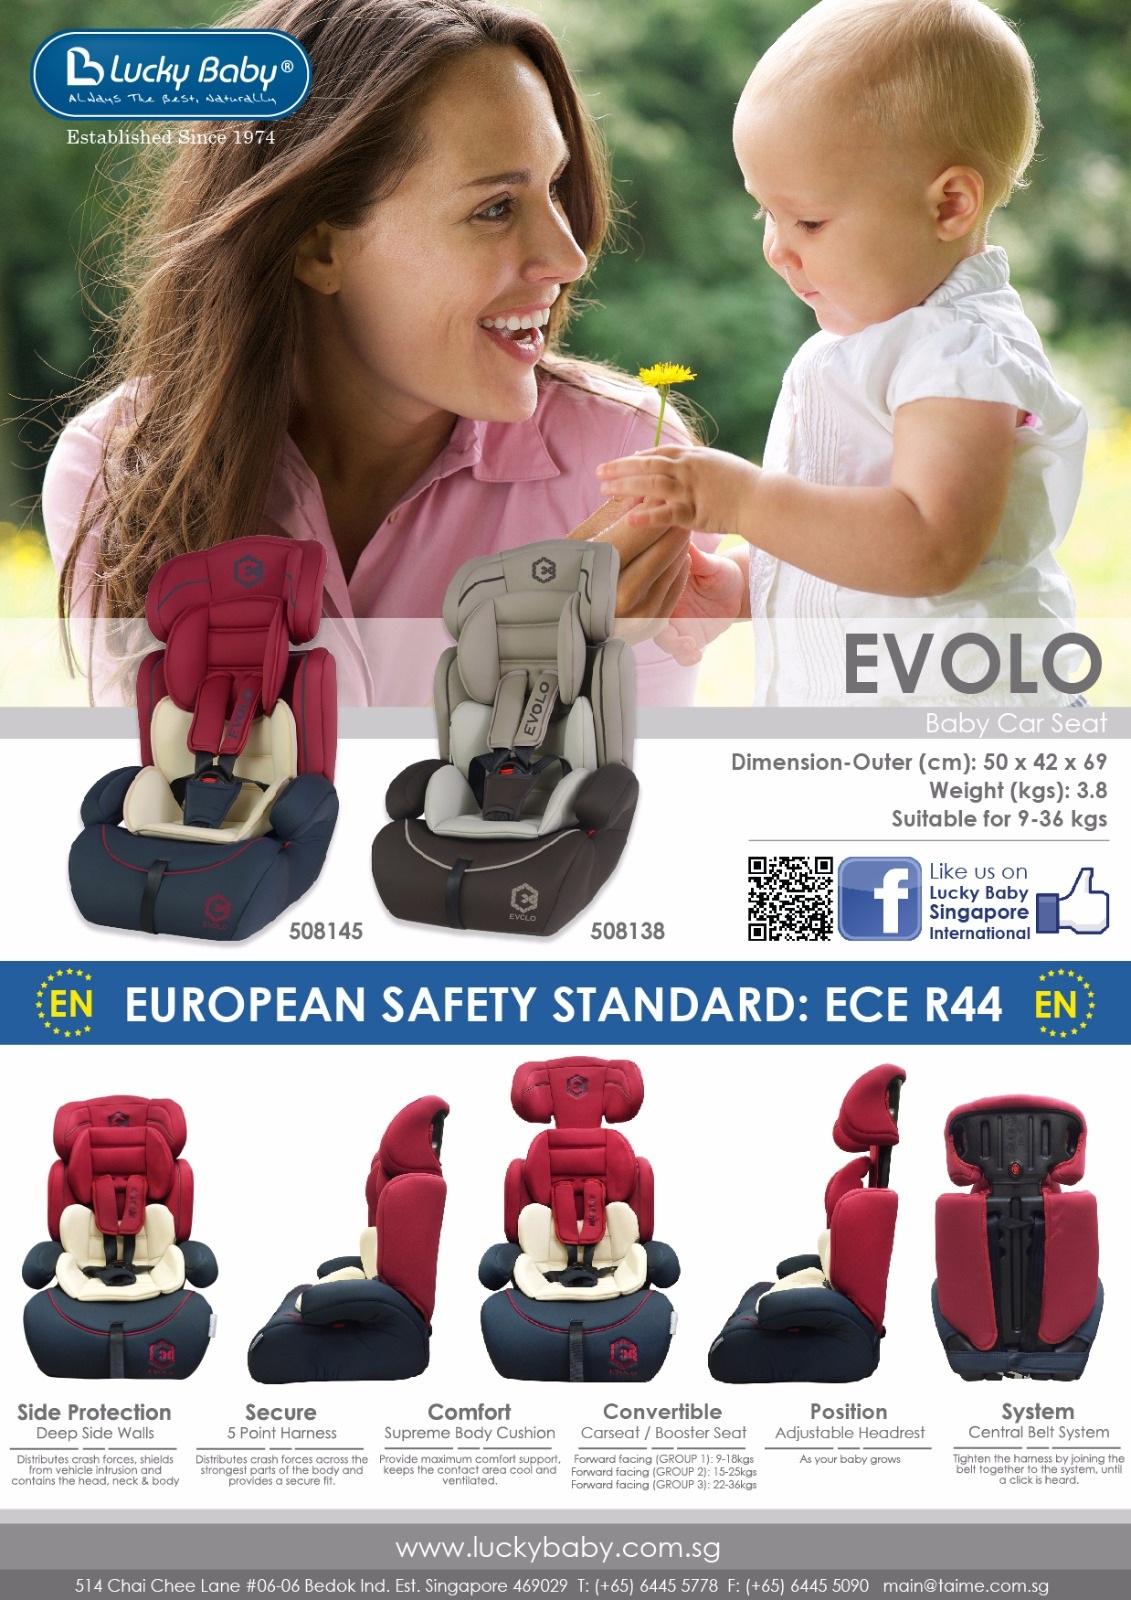 lucky-baby-evolo-safety-car-seat12.jpg